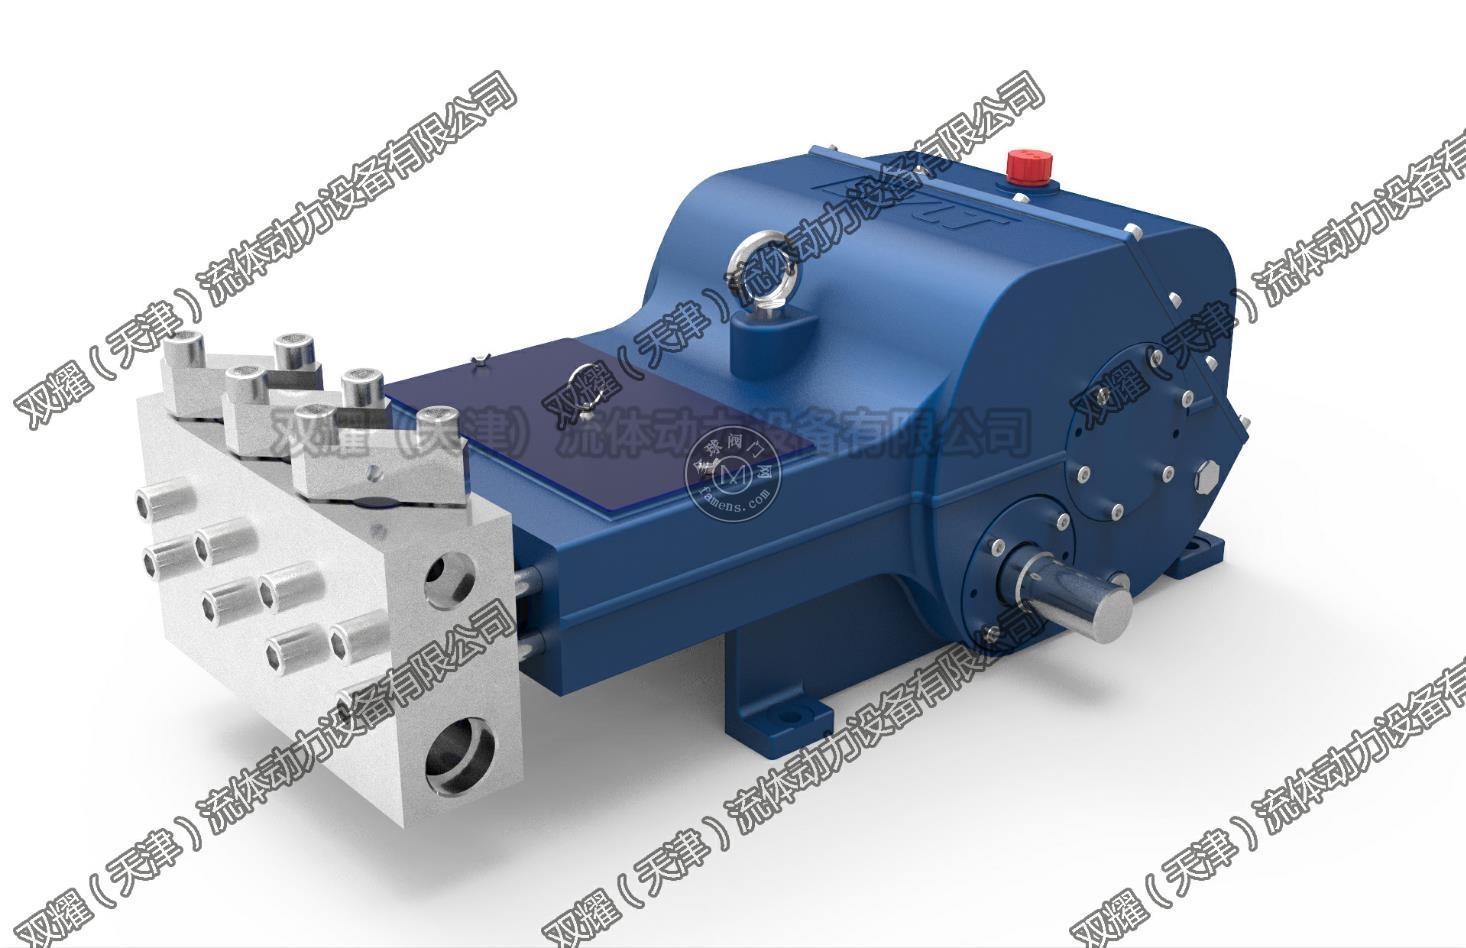 雙耀高壓泵-高壓試壓泵-高壓清洗泵